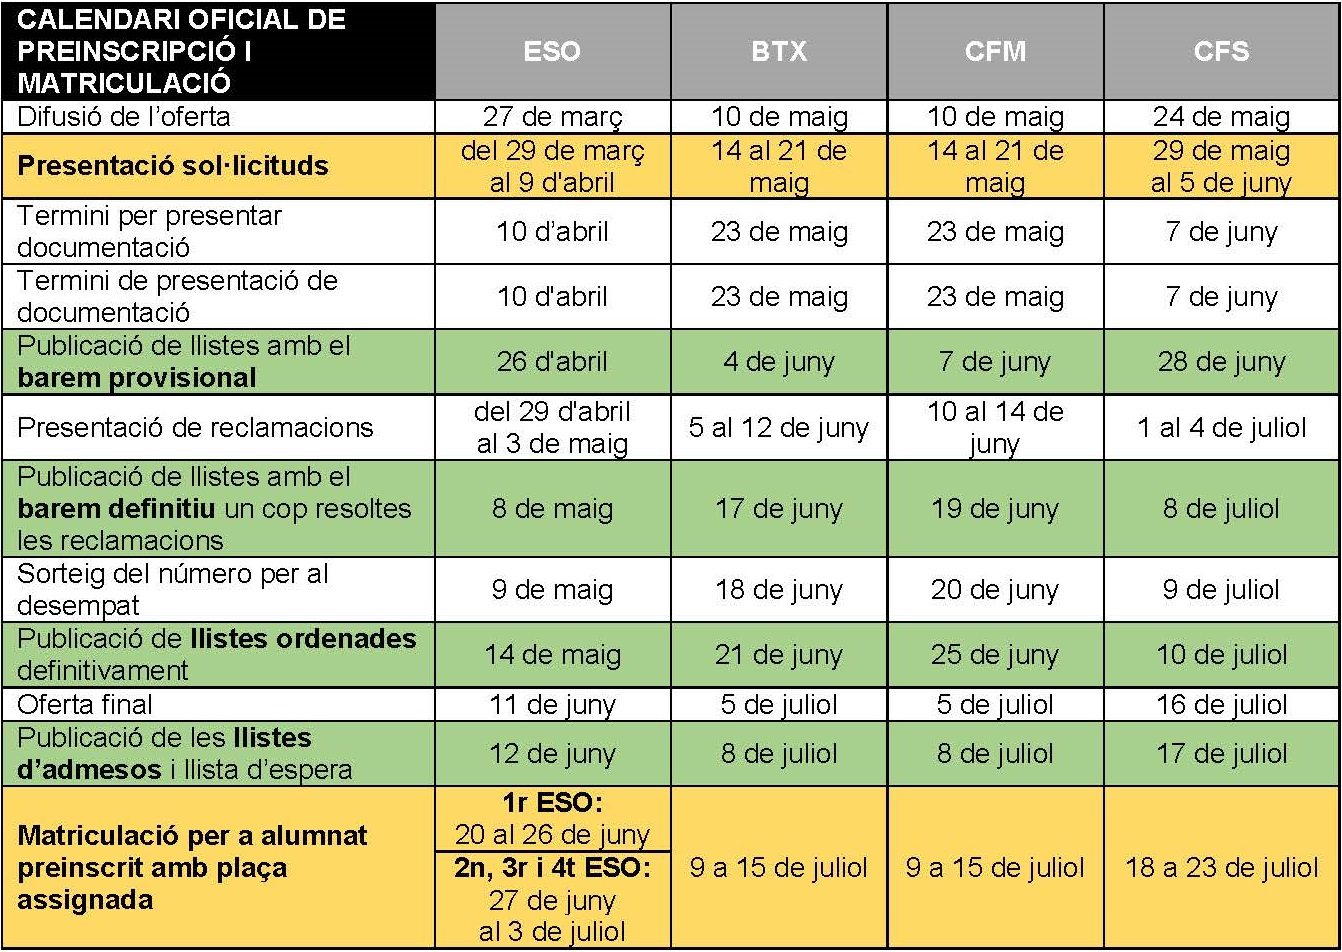 Calendari Preinscripcio i Matricula